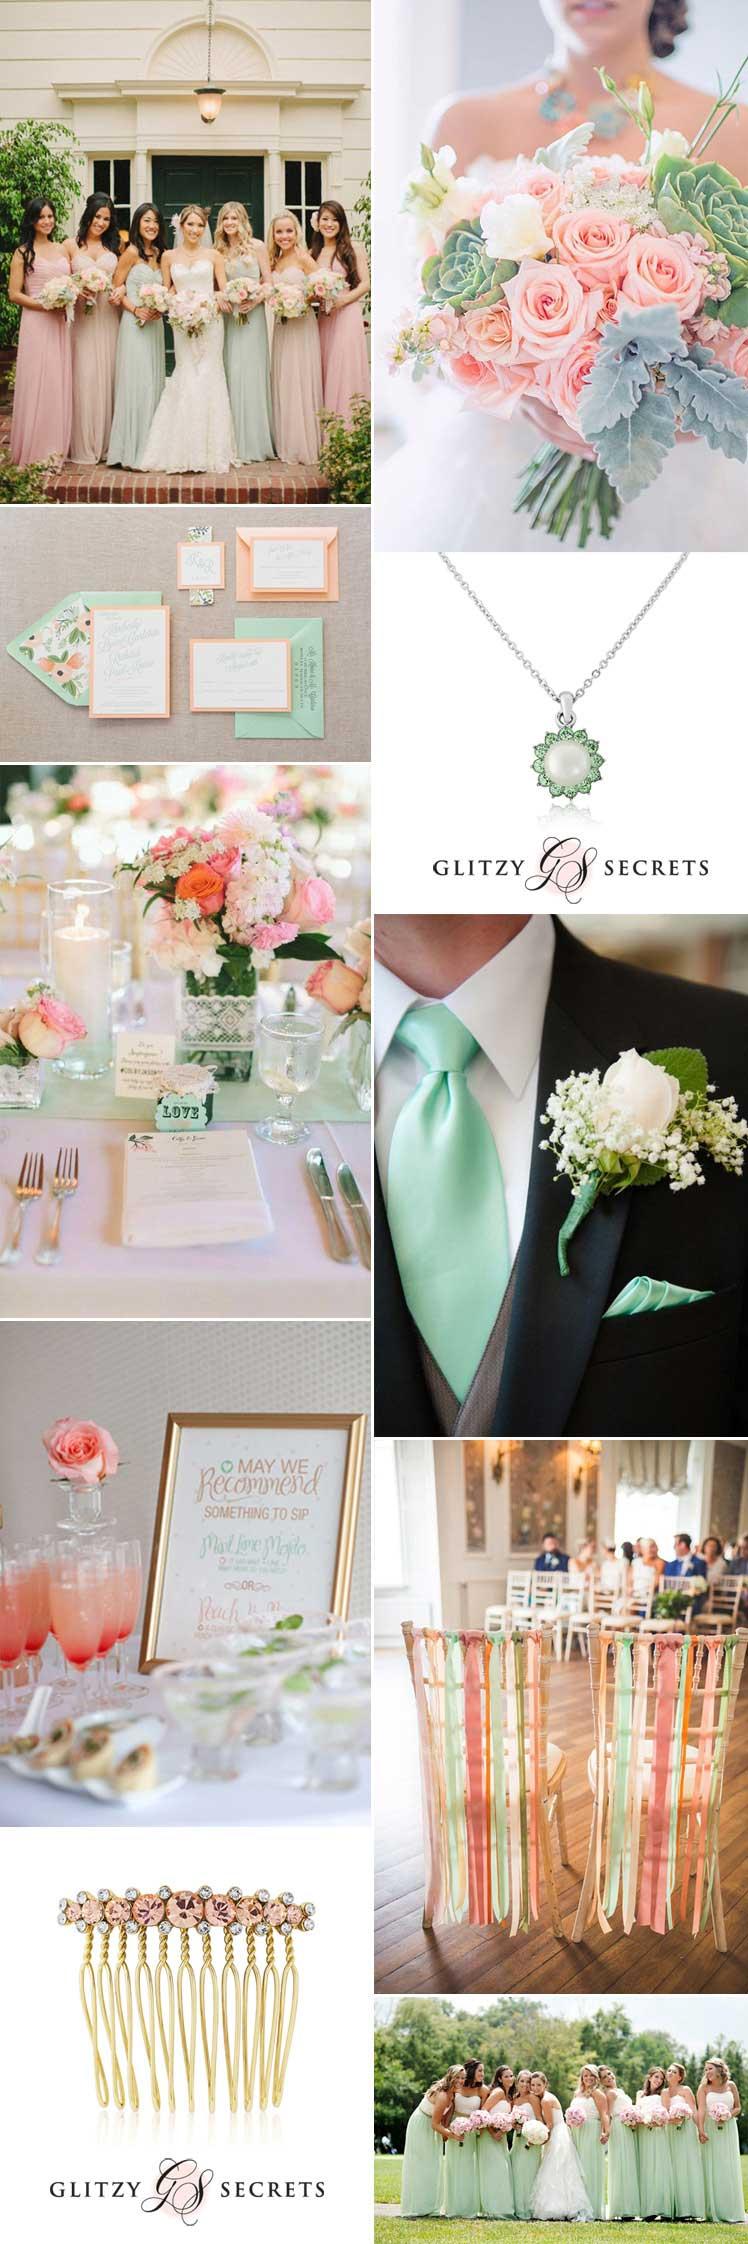 Peach Orange And Green Wedding Theme | deweddingjpg.com